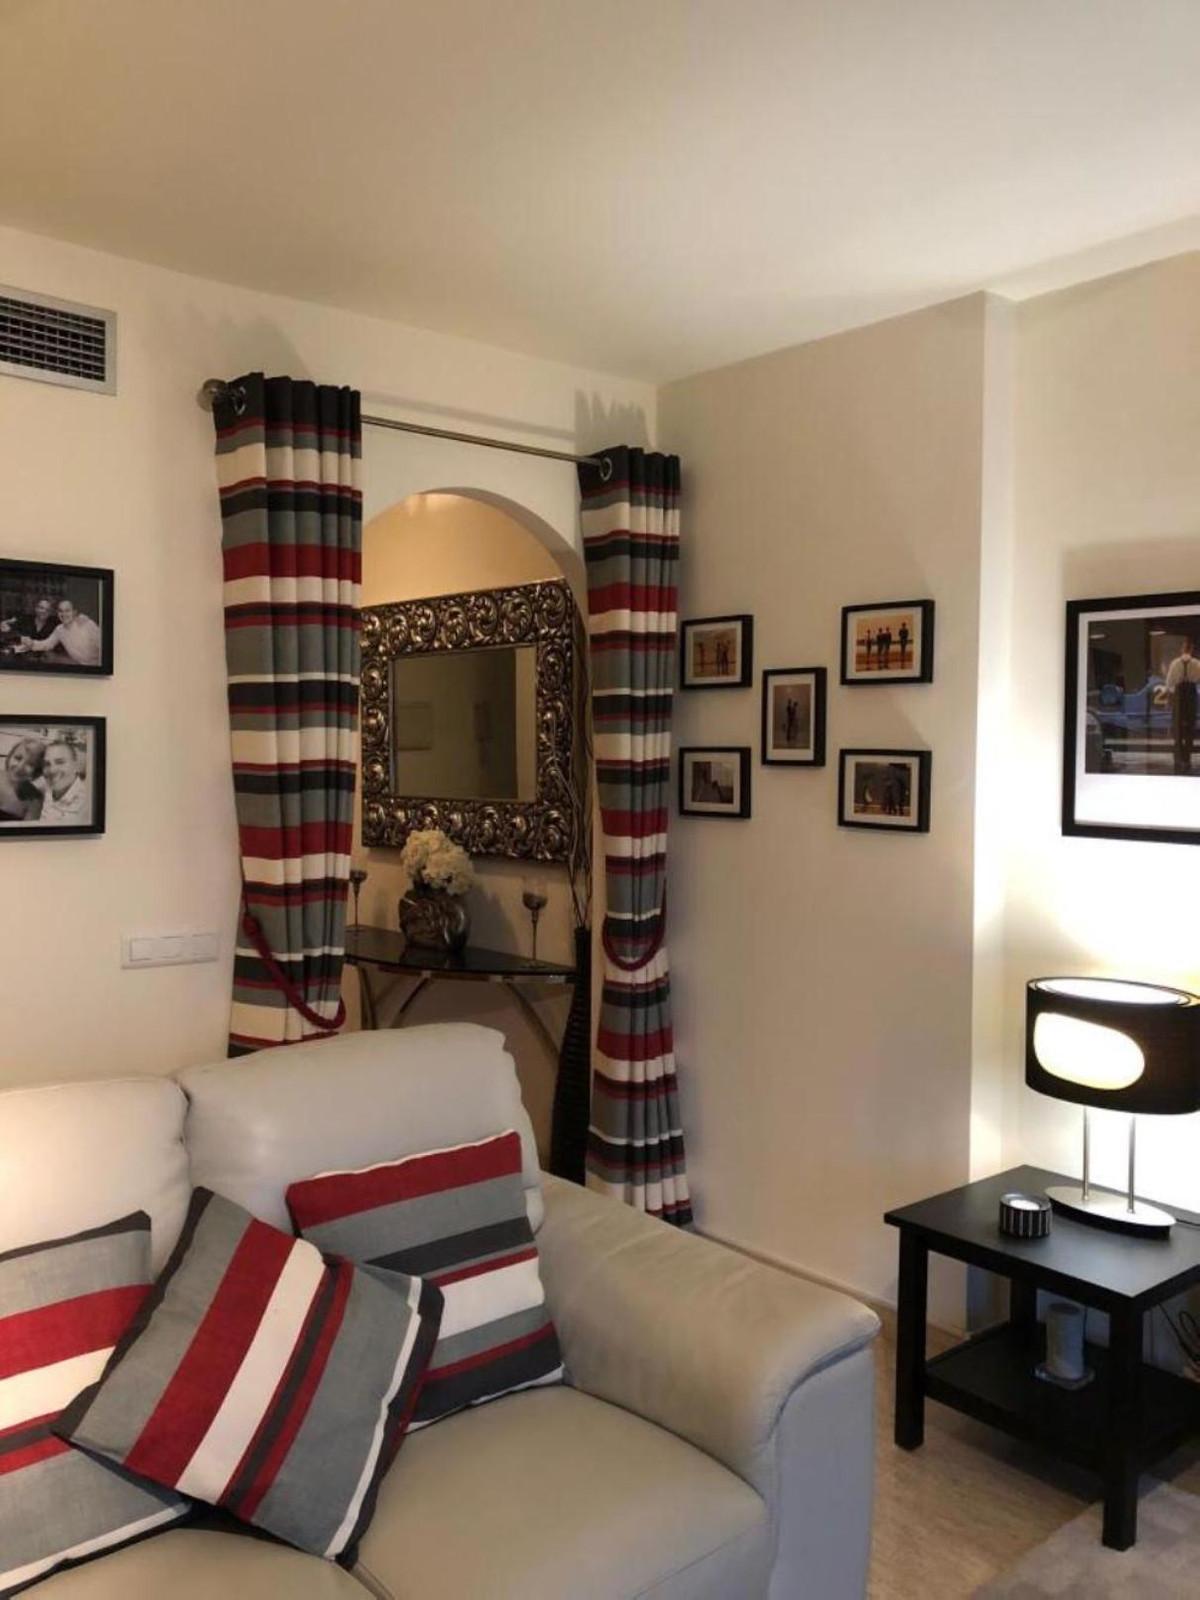 3 Bedroom Detached Villa For Sale Miraflores